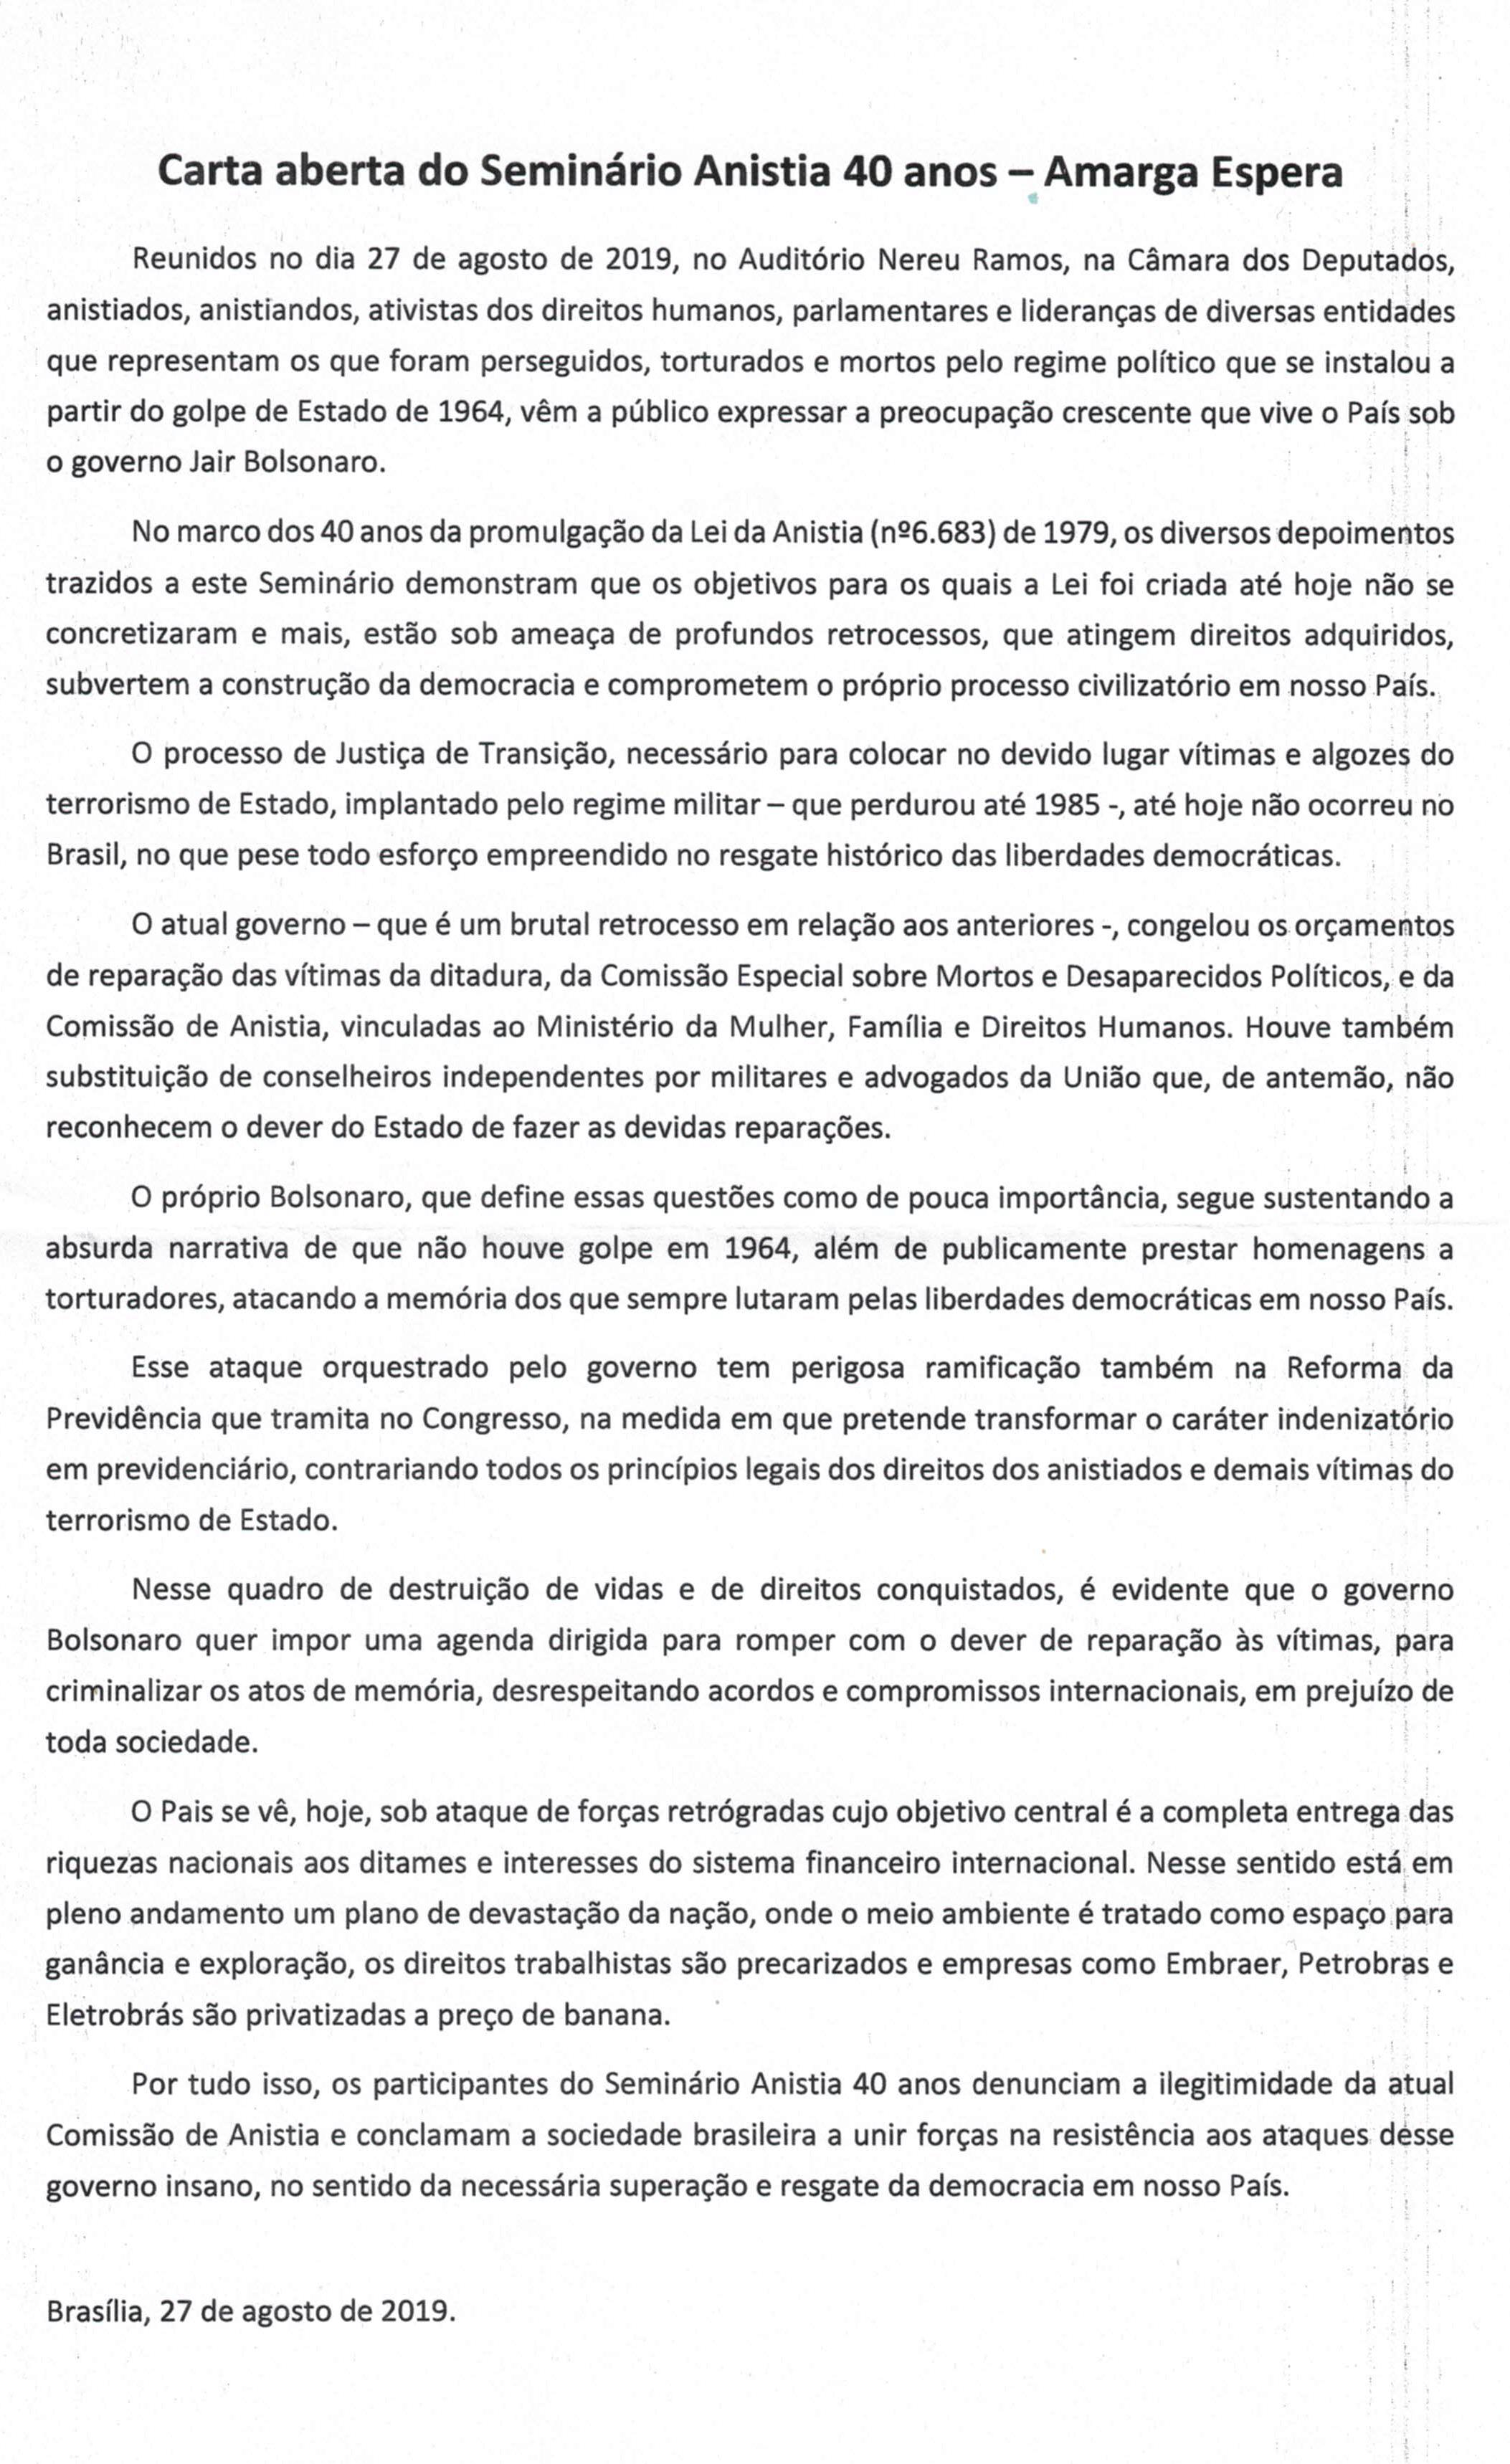 CARTA ABERTA SEMINARIO 40 ANOS 2019